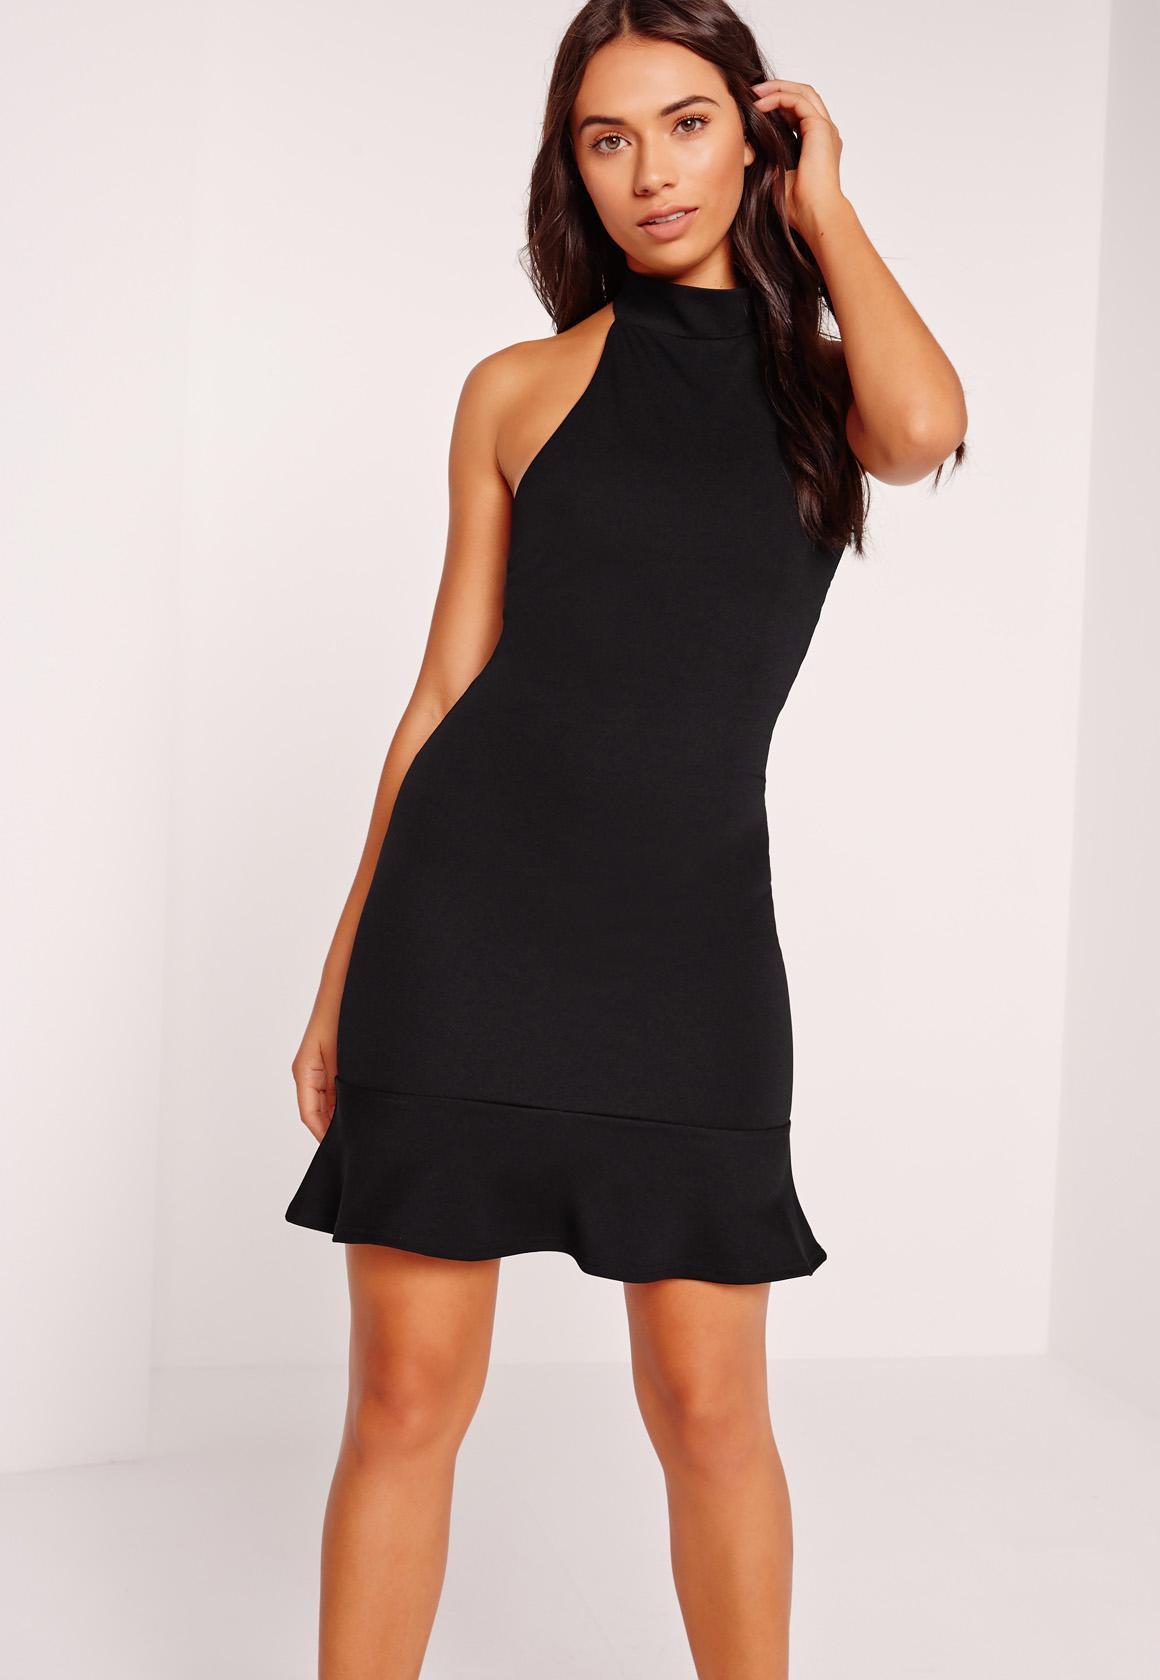 Black Halter Neck Dress | Ejn Dress